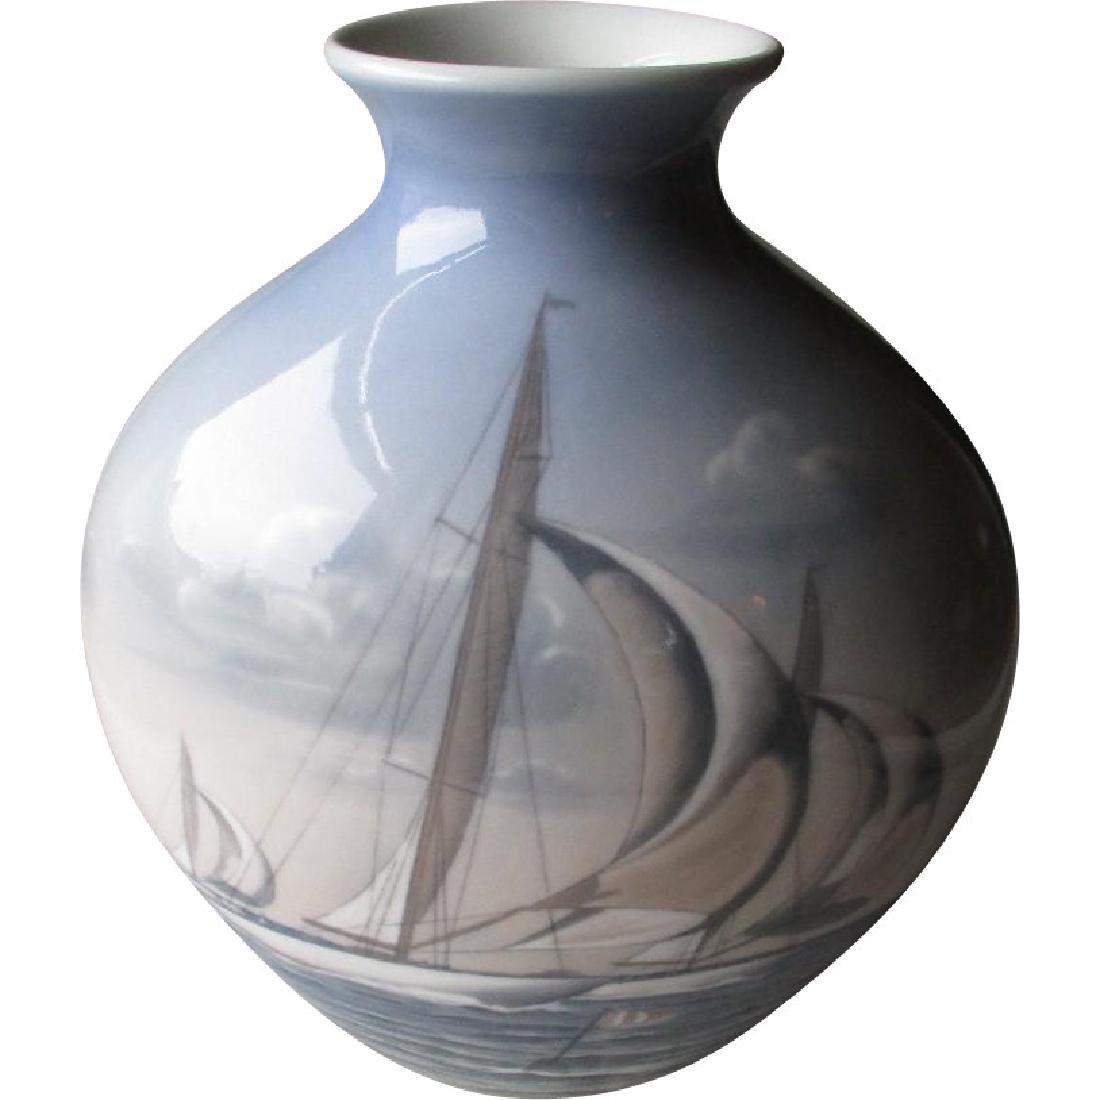 Stunning Large Bing & Grondahl Vase with Racing